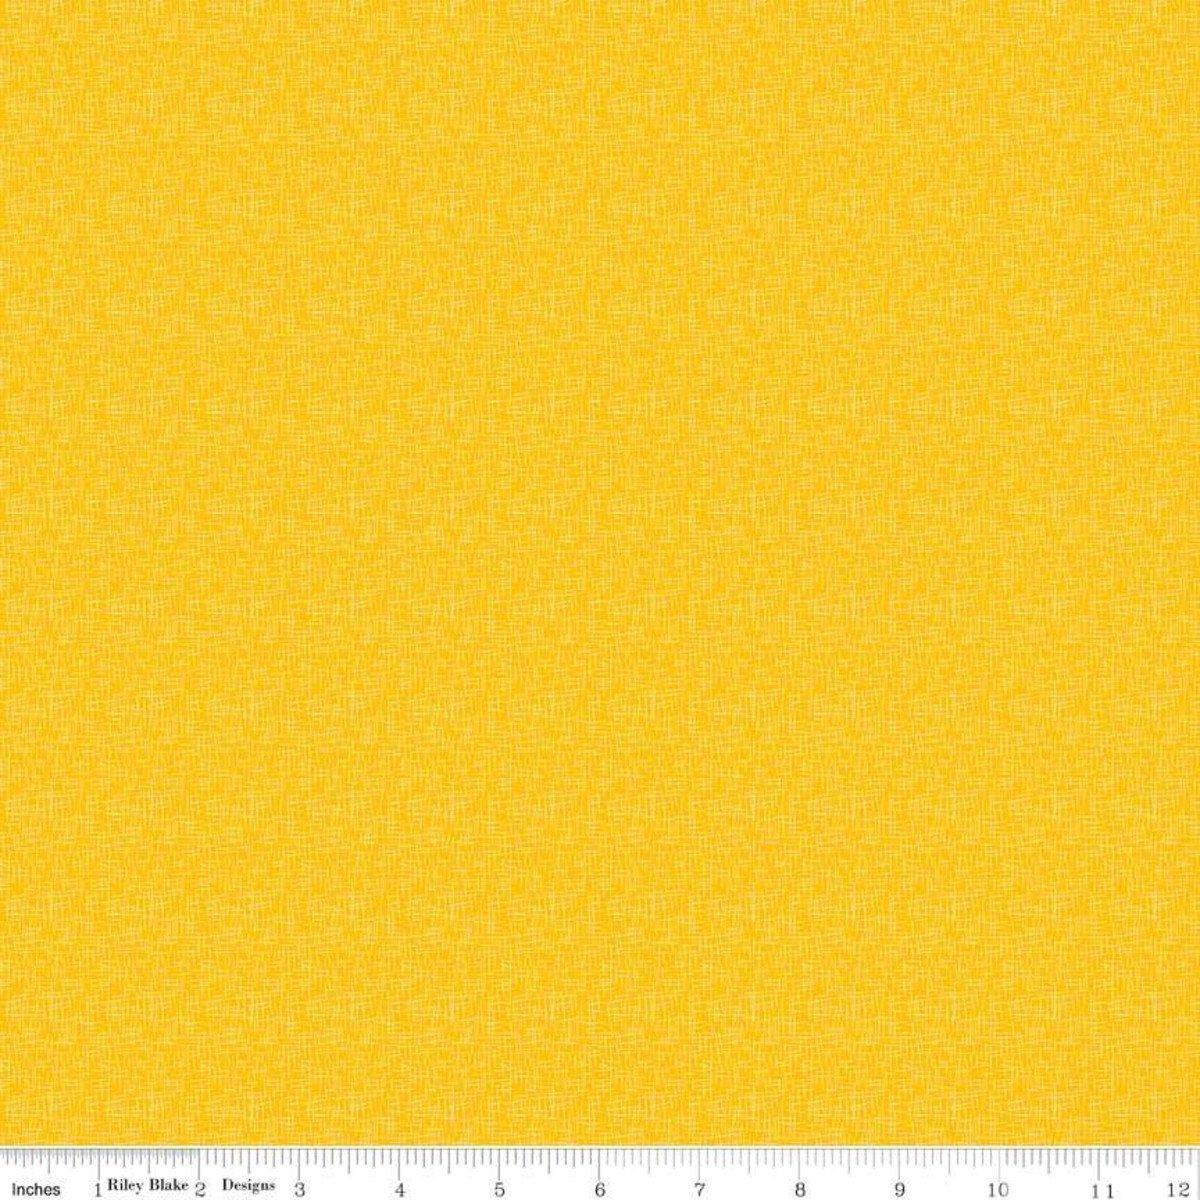 Riley Blake Hashtag Mustard